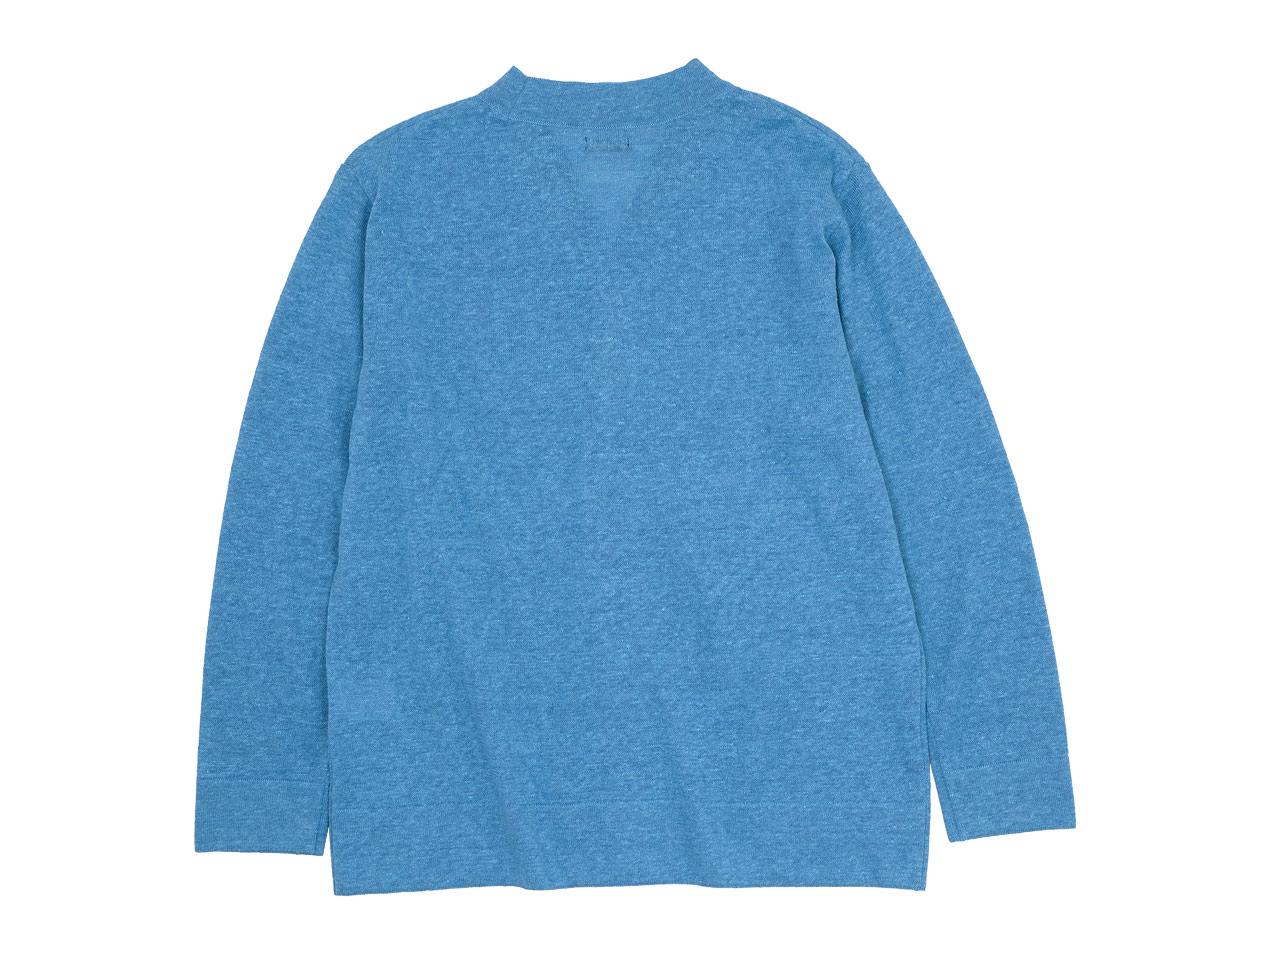 maillot mature summer cardigan